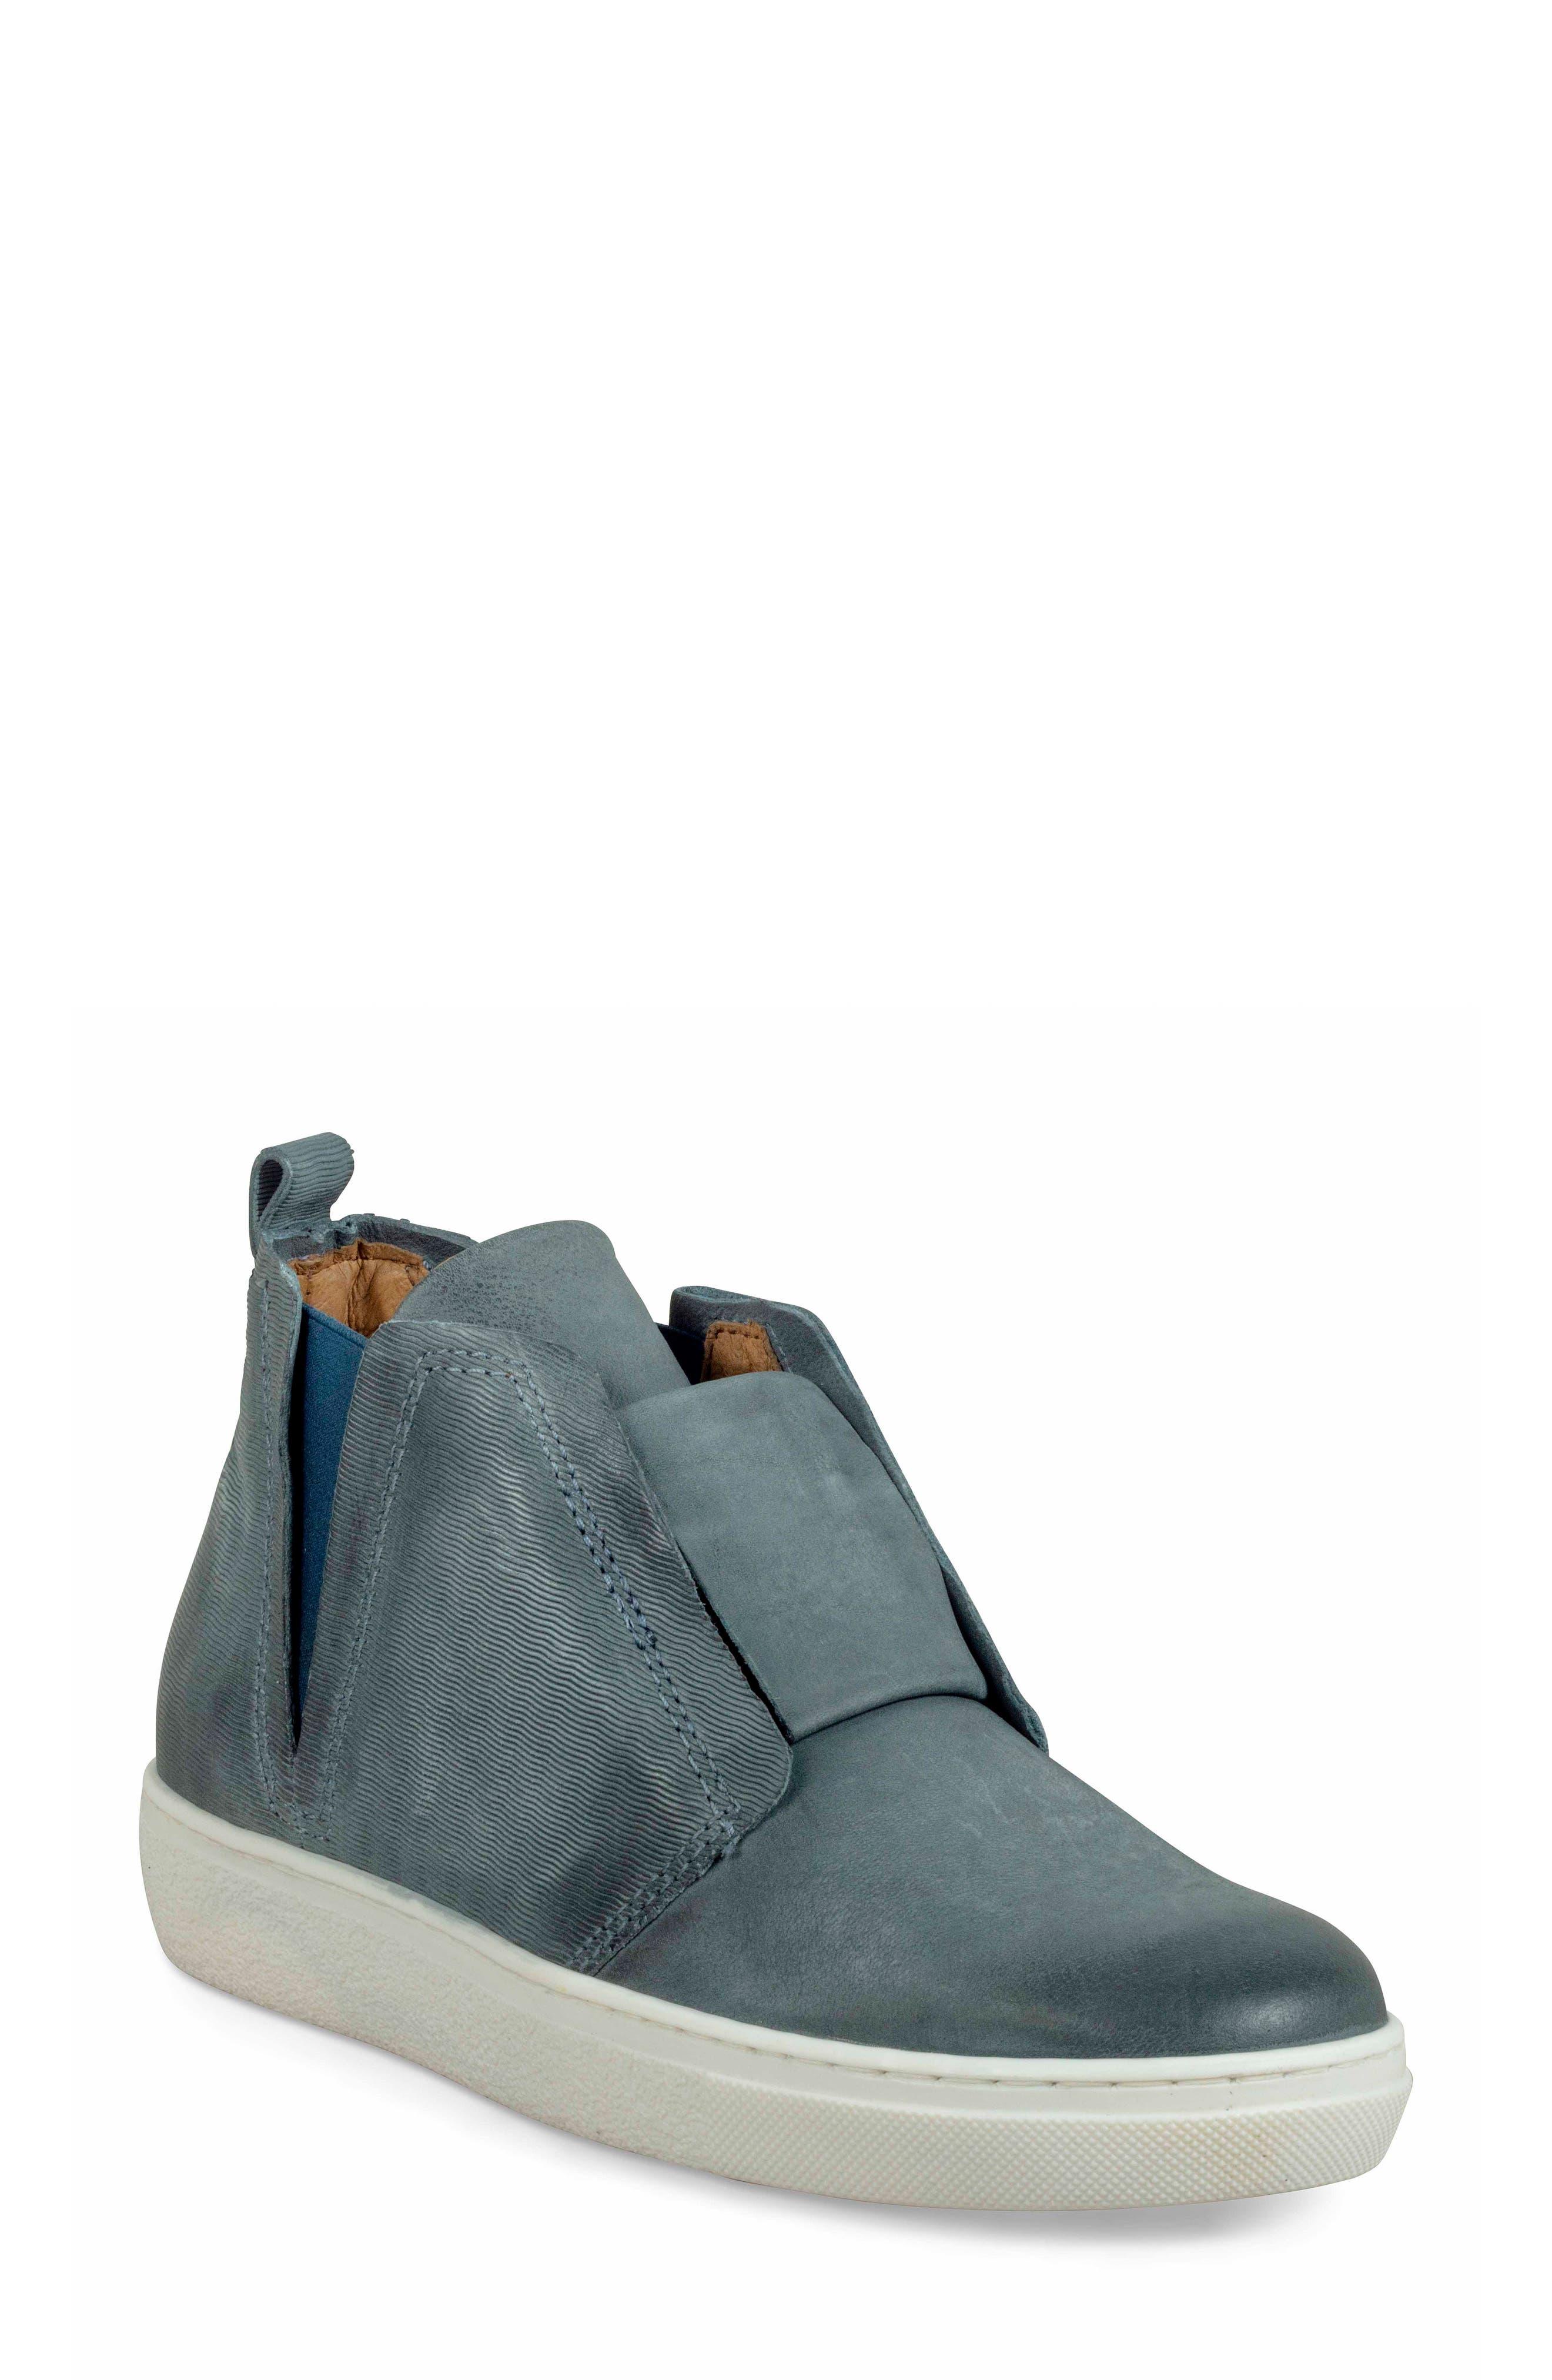 Miz Mooz Laurent High Top Sneaker - Blue